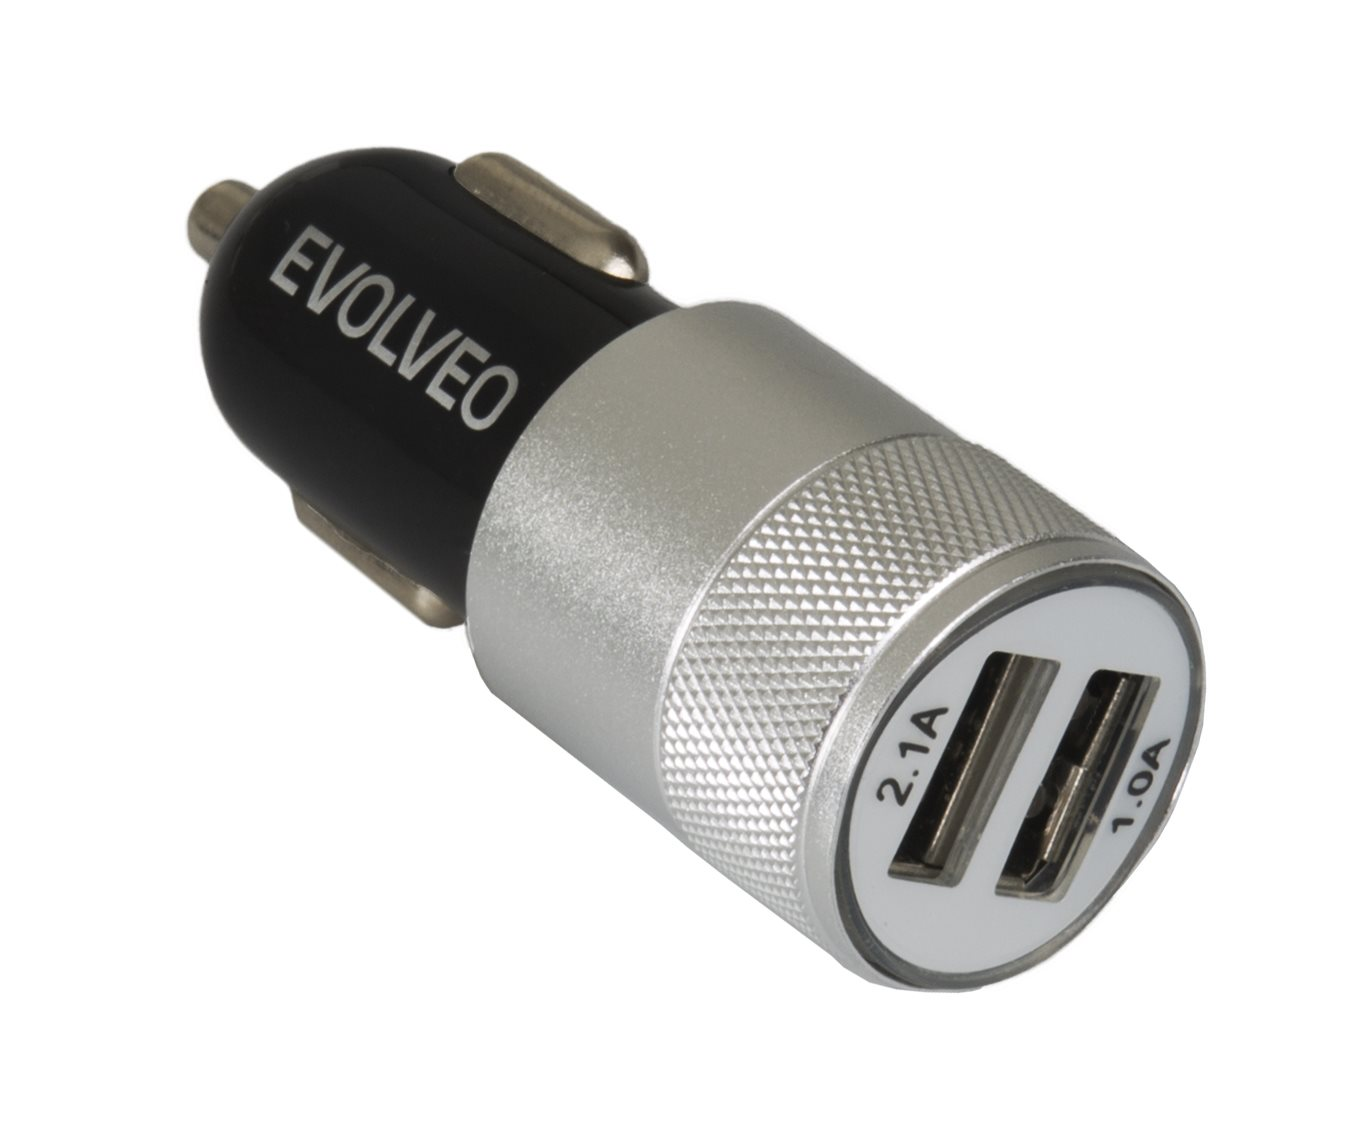 EVOLVEO MX220, USB nabíječka do auta]